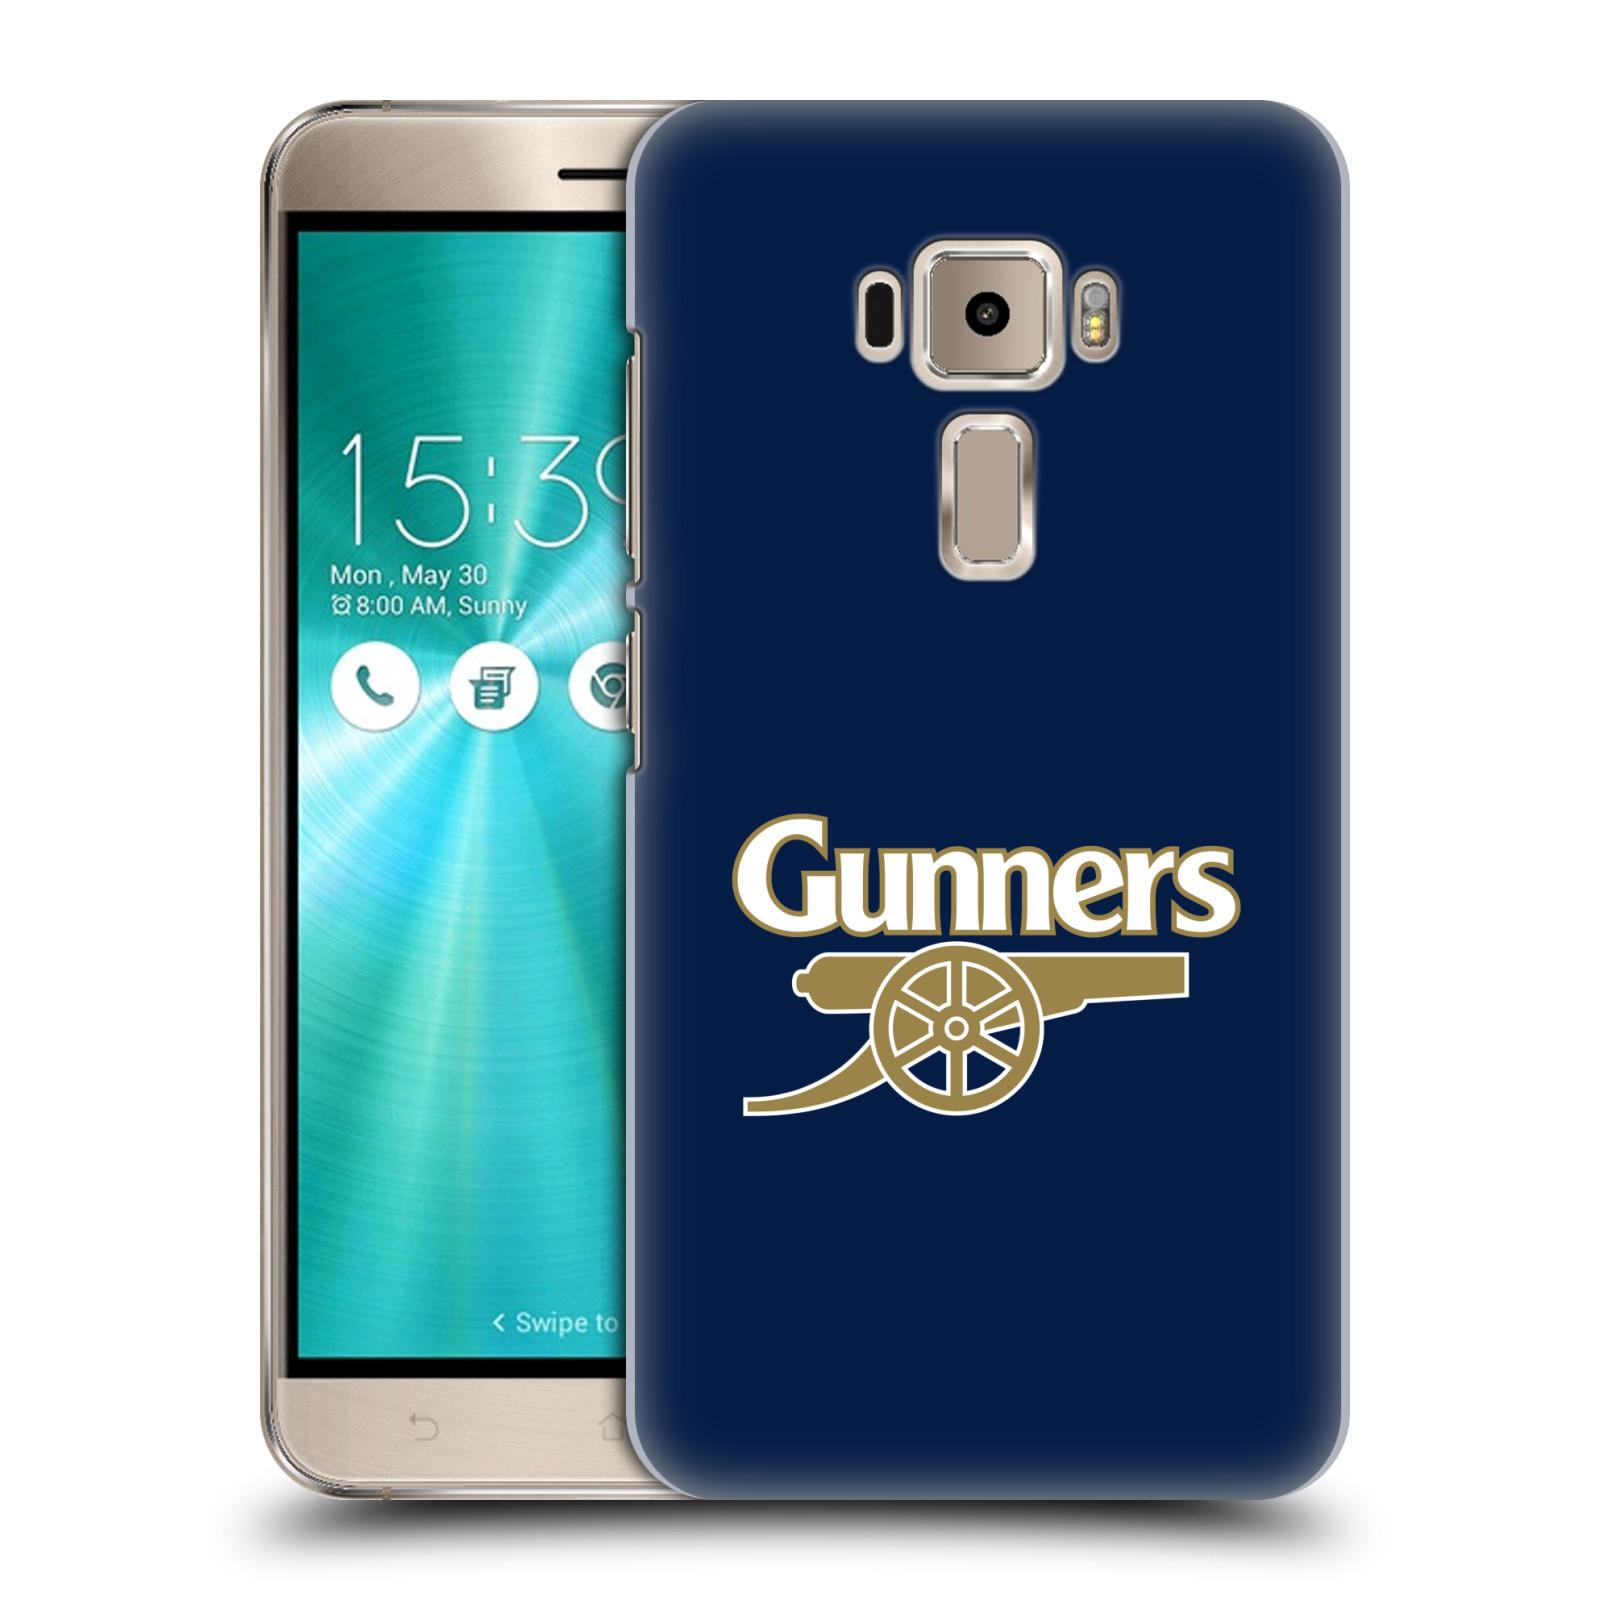 Plastové pouzdro na mobil Asus ZenFone 3 ZE520KL - Head Case - Arsenal FC - Gunners